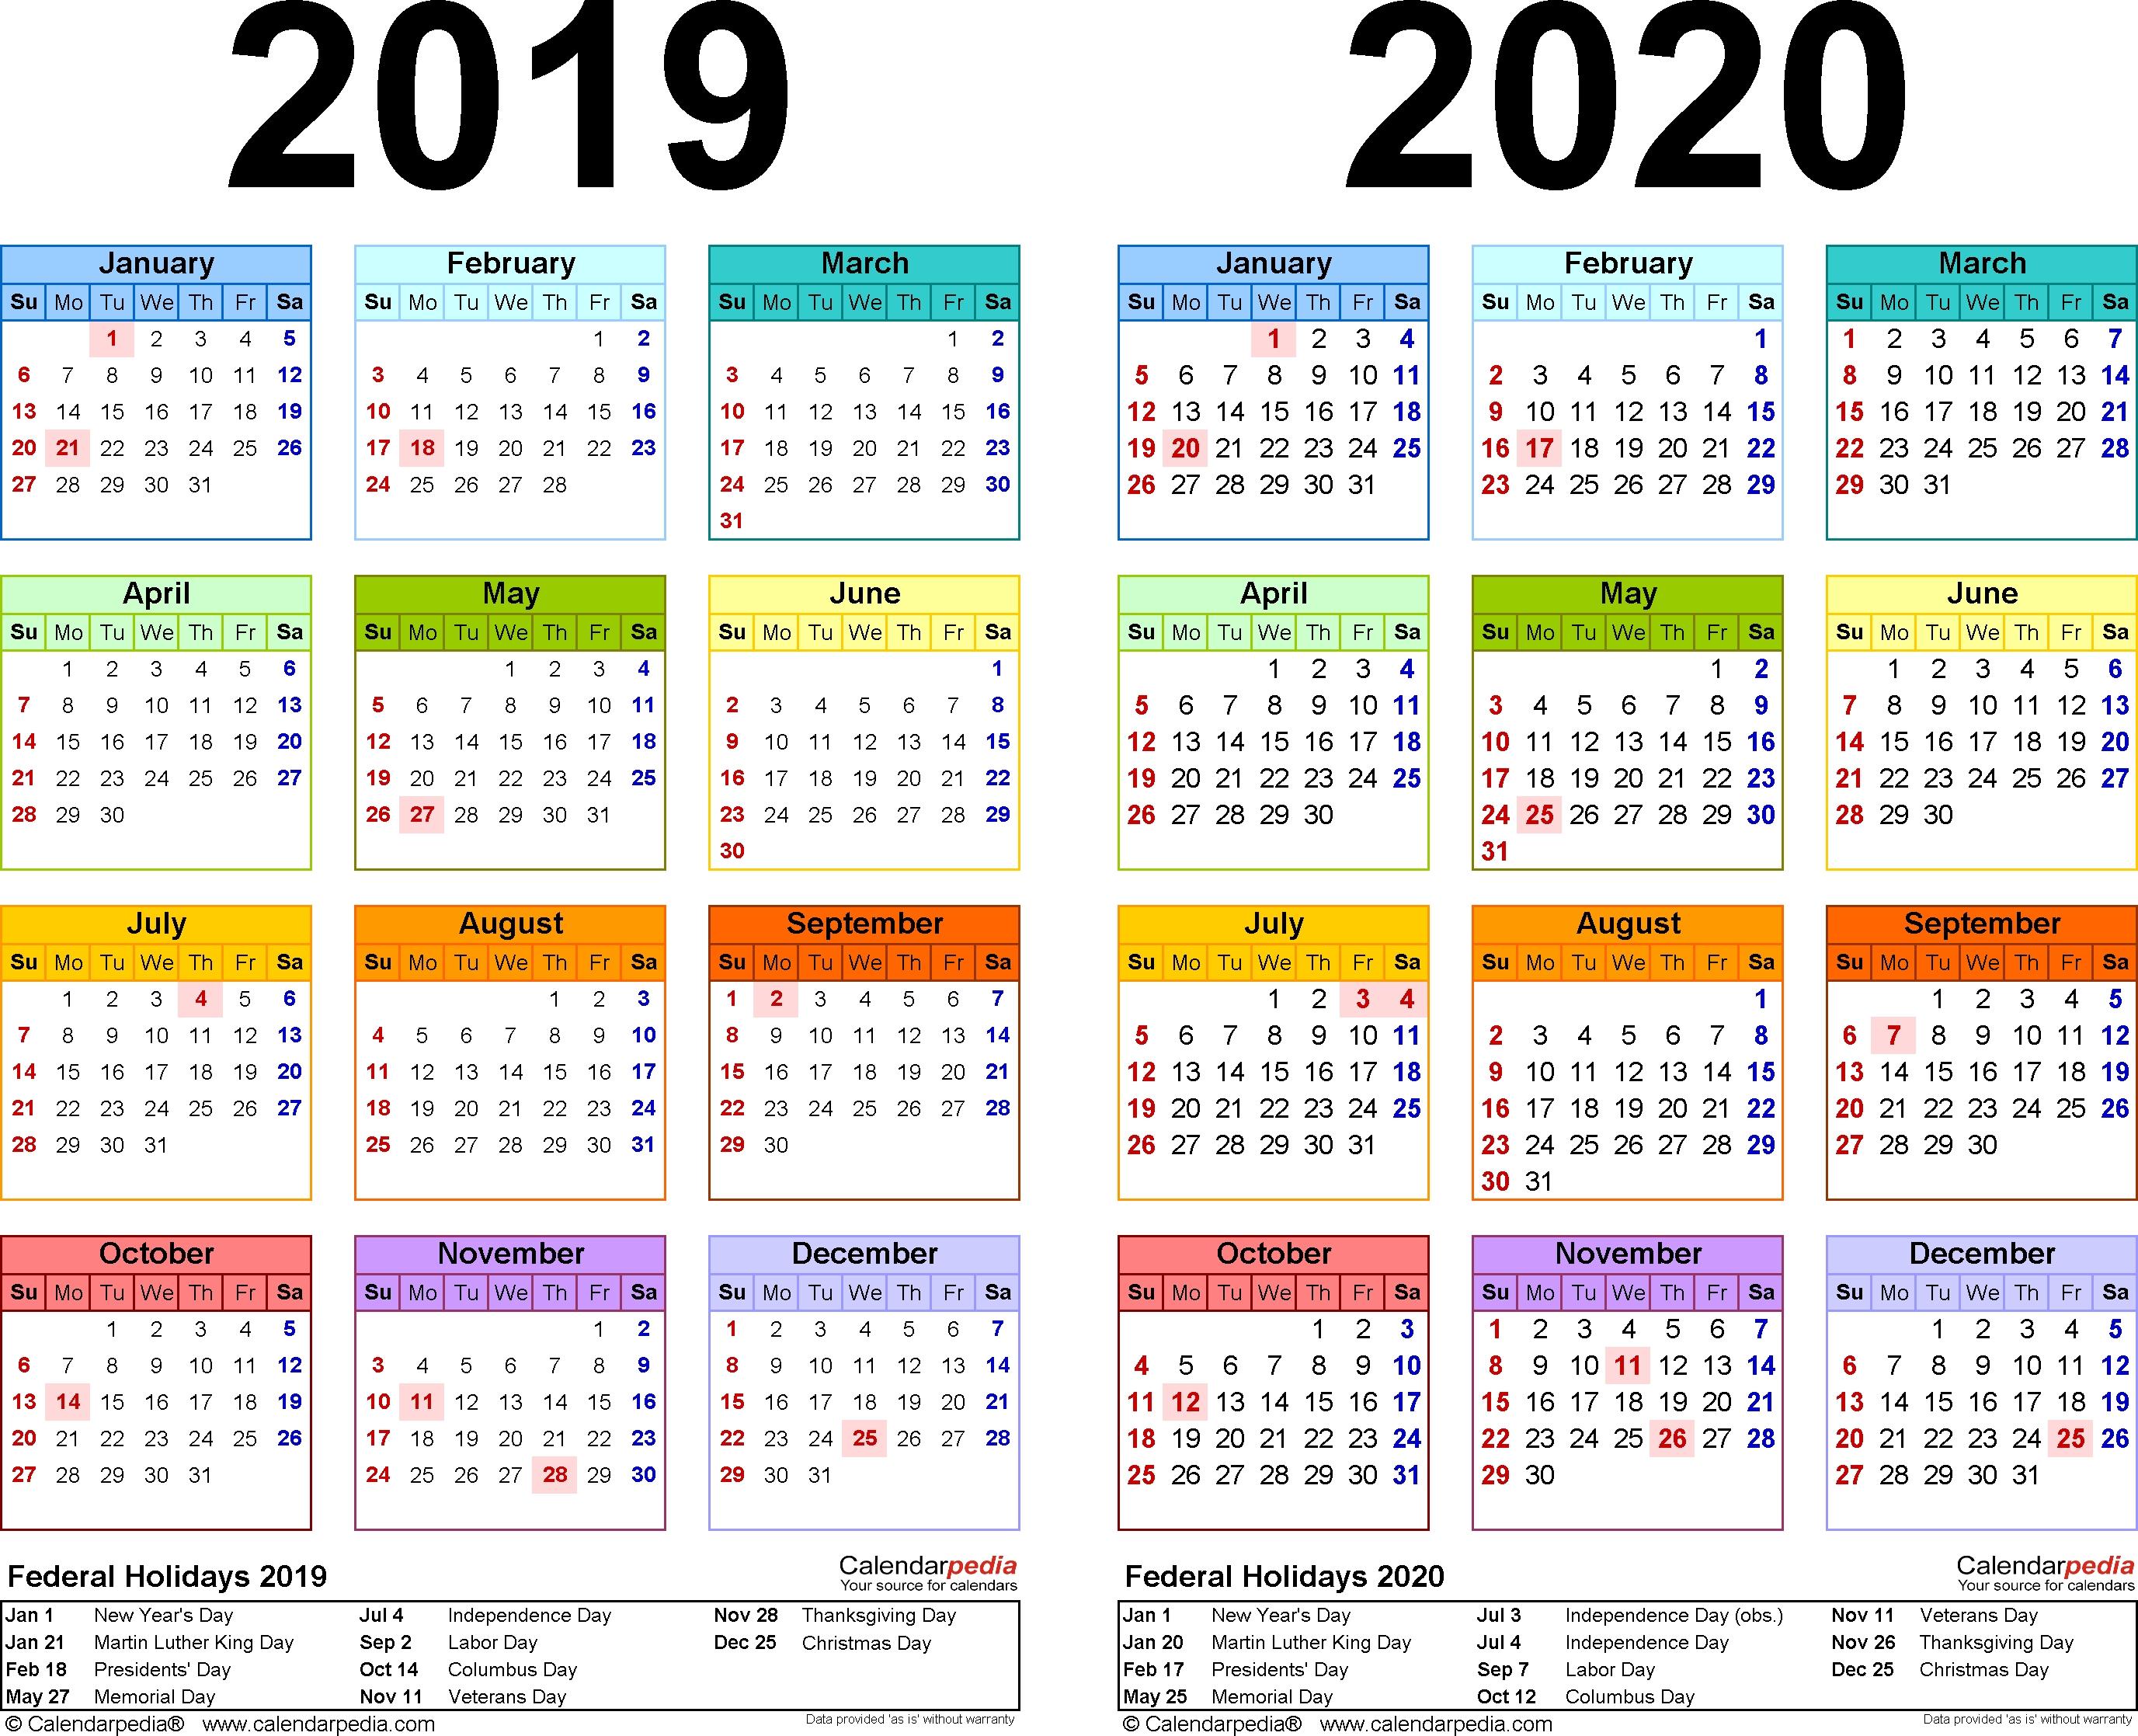 2019-2020 Calendar - Free Printable Two-Year Word Calendars intended for 2019-2020 Quarterly Calendar